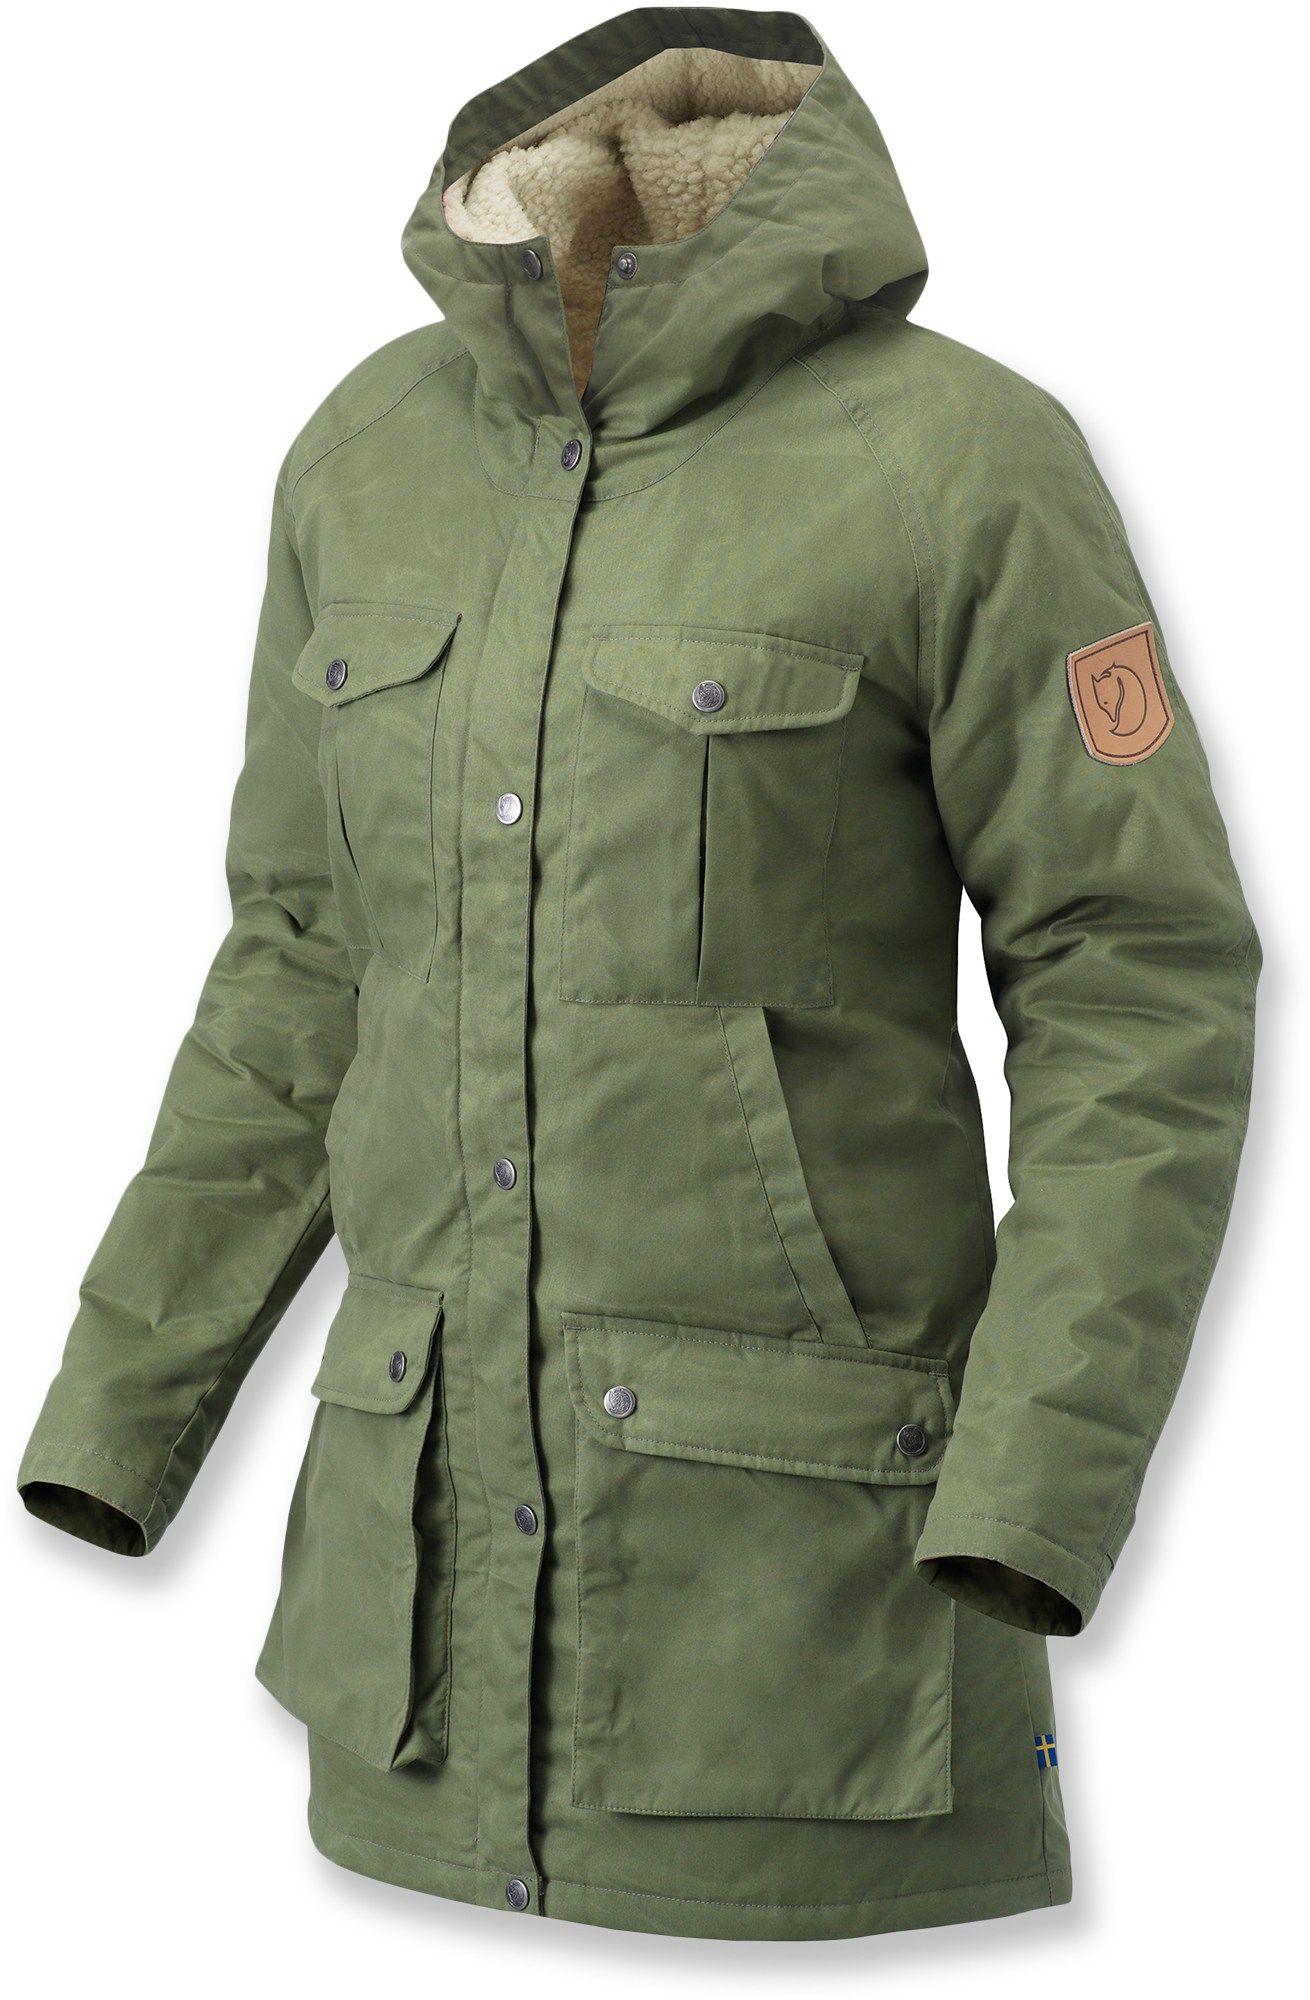 Fjallraven Greenland Winter Jacket Women S Rei Co Op Womens Parka Fjallraven Women Winter Parka